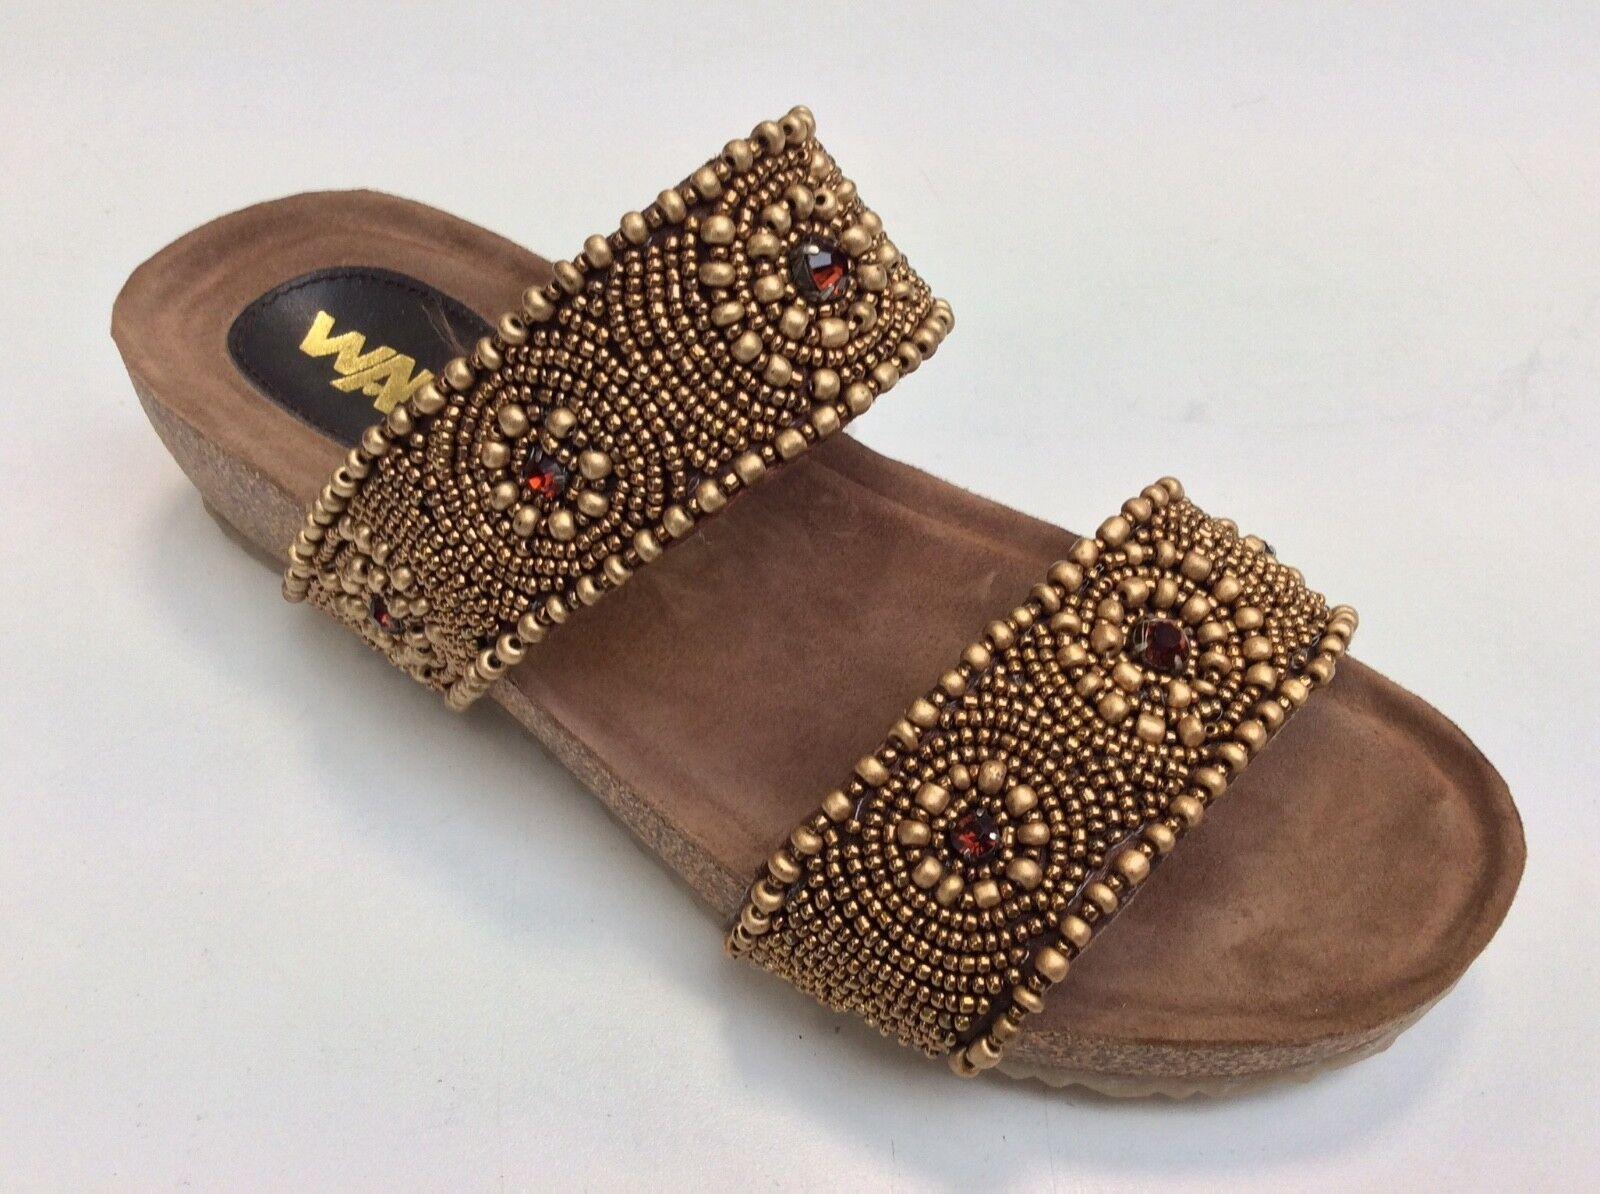 Schuhe Melluso K80052 col multi Braun Sandaleeo vera pelle comodo